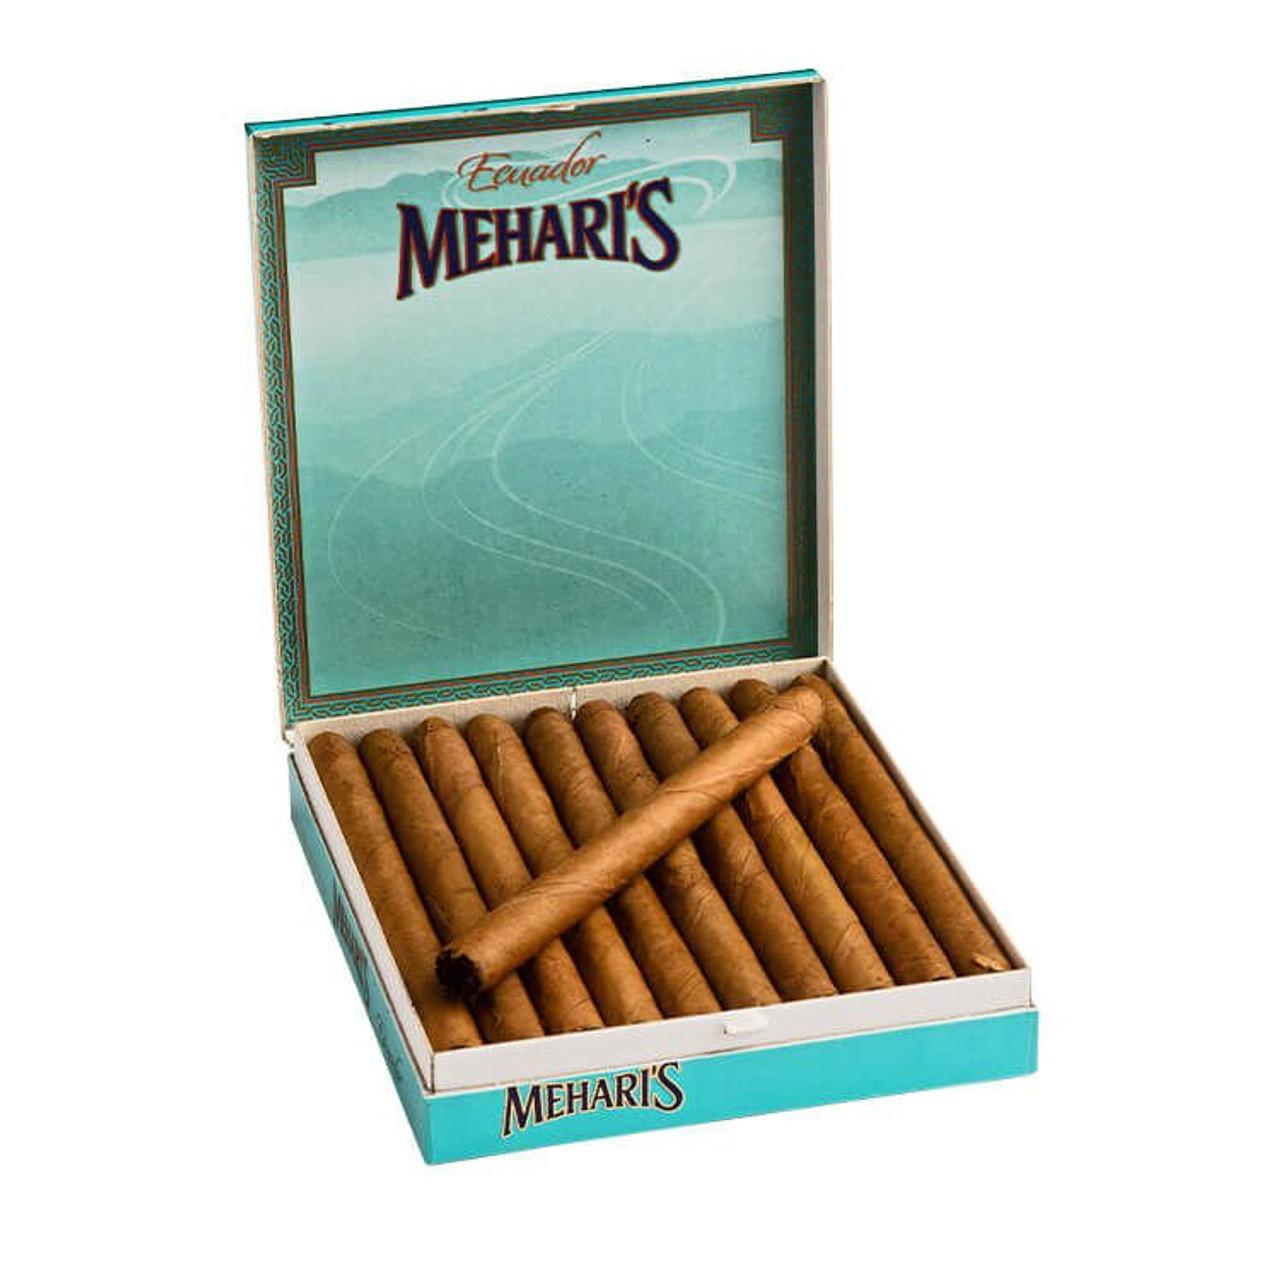 Agio Mehari's Cigarillos Ecuador Cigars - 4 x 23 (10 packs of 20(200 total))